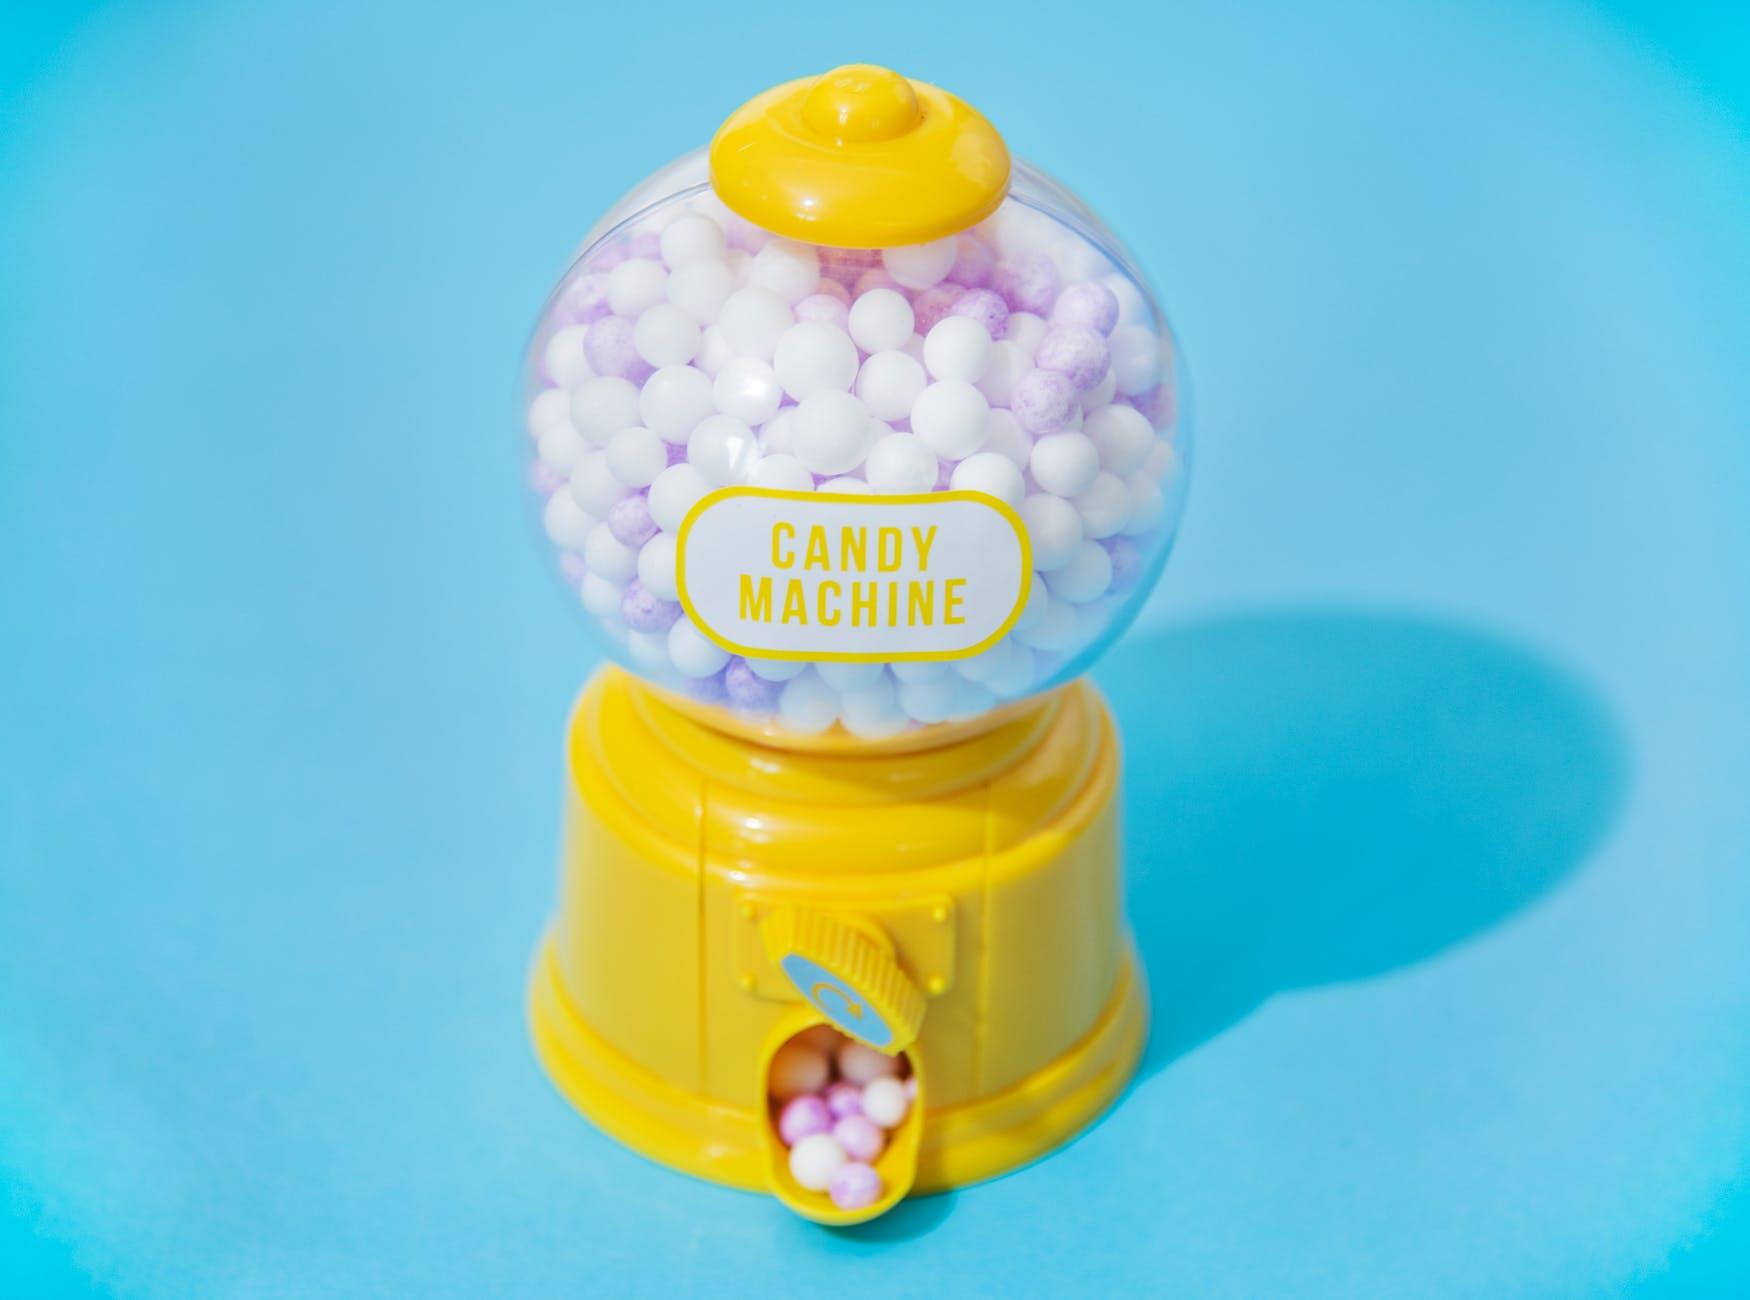 marketing ideas for vending machine companies